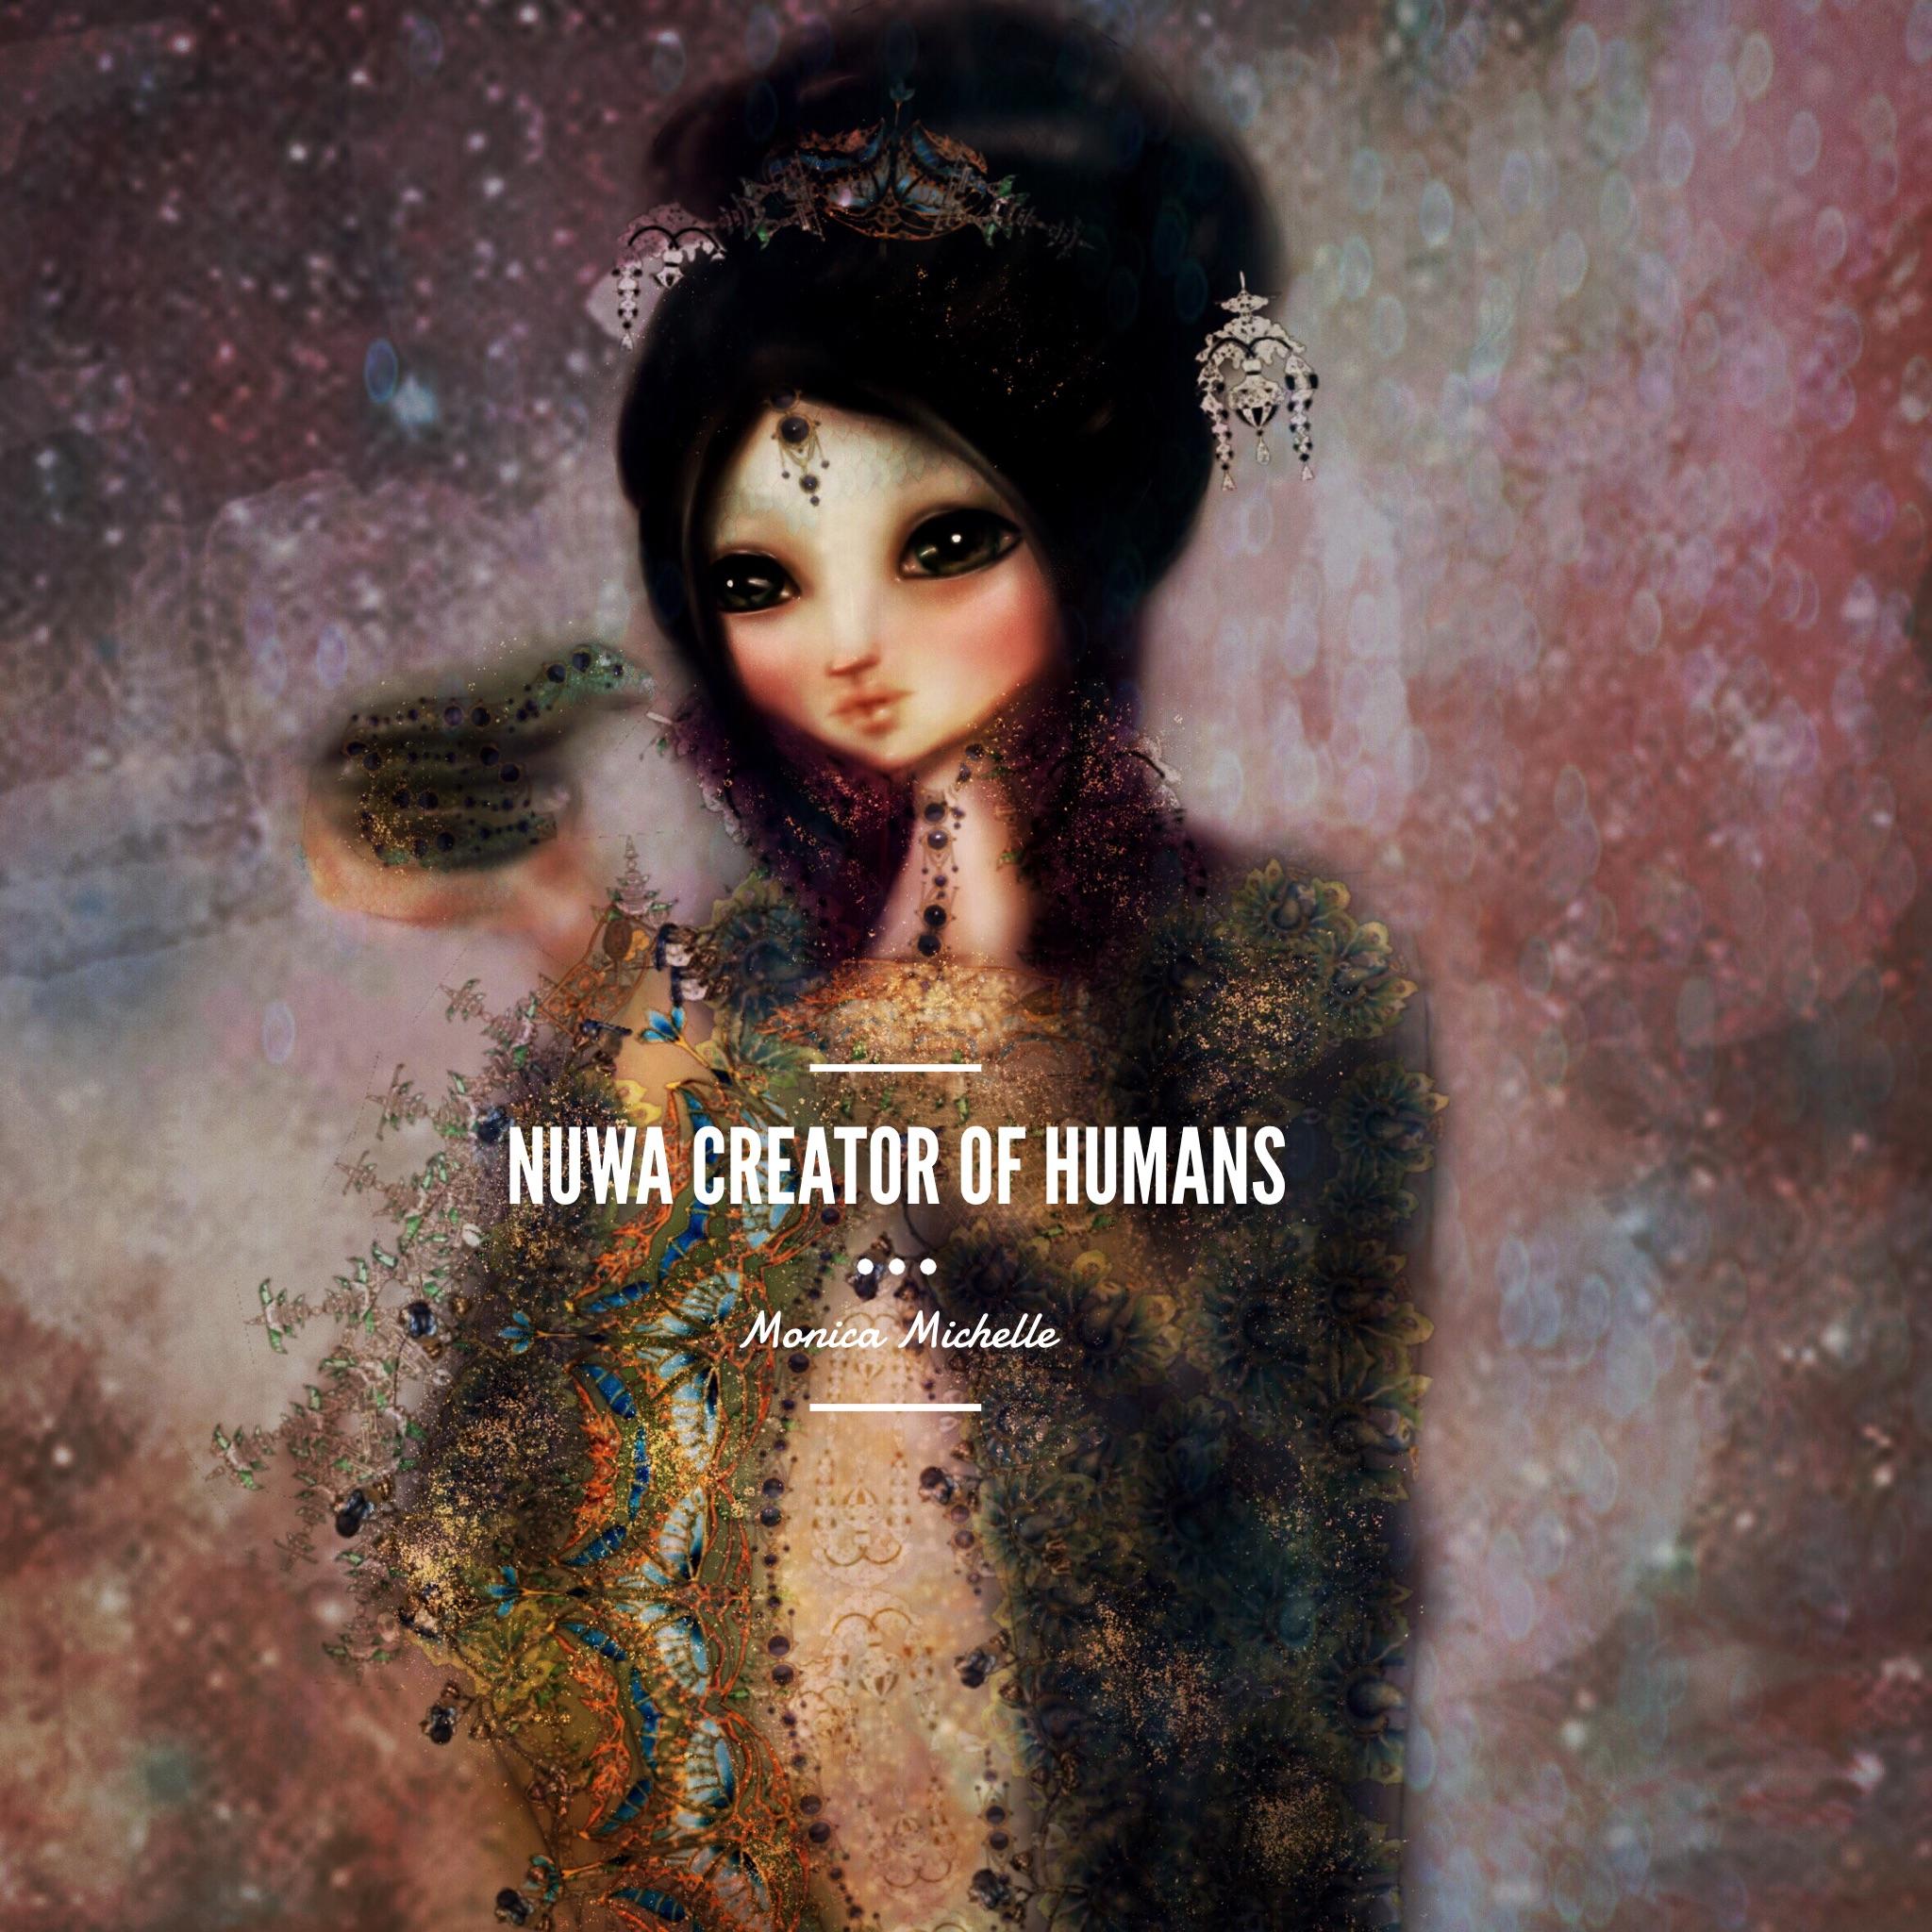 Nuwa-goddess-illustration.jpg